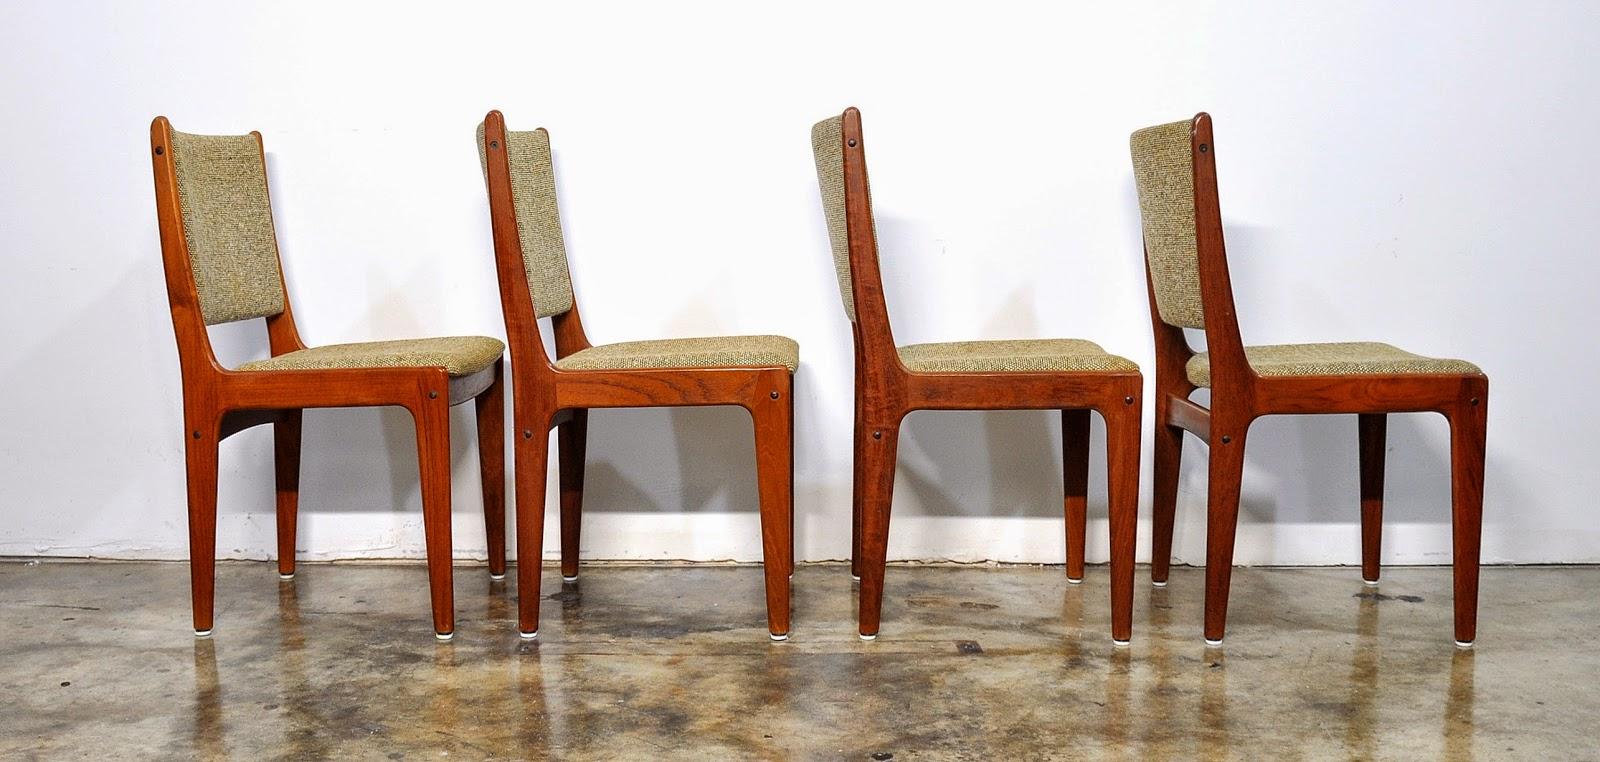 SELECT MODERN Set of 4 Danish Modern Teak Dining Chairs : ScandinavianTeakDiningChairs7 from midcenturymoderndesignfinds.blogspot.com size 1600 x 762 jpeg 241kB